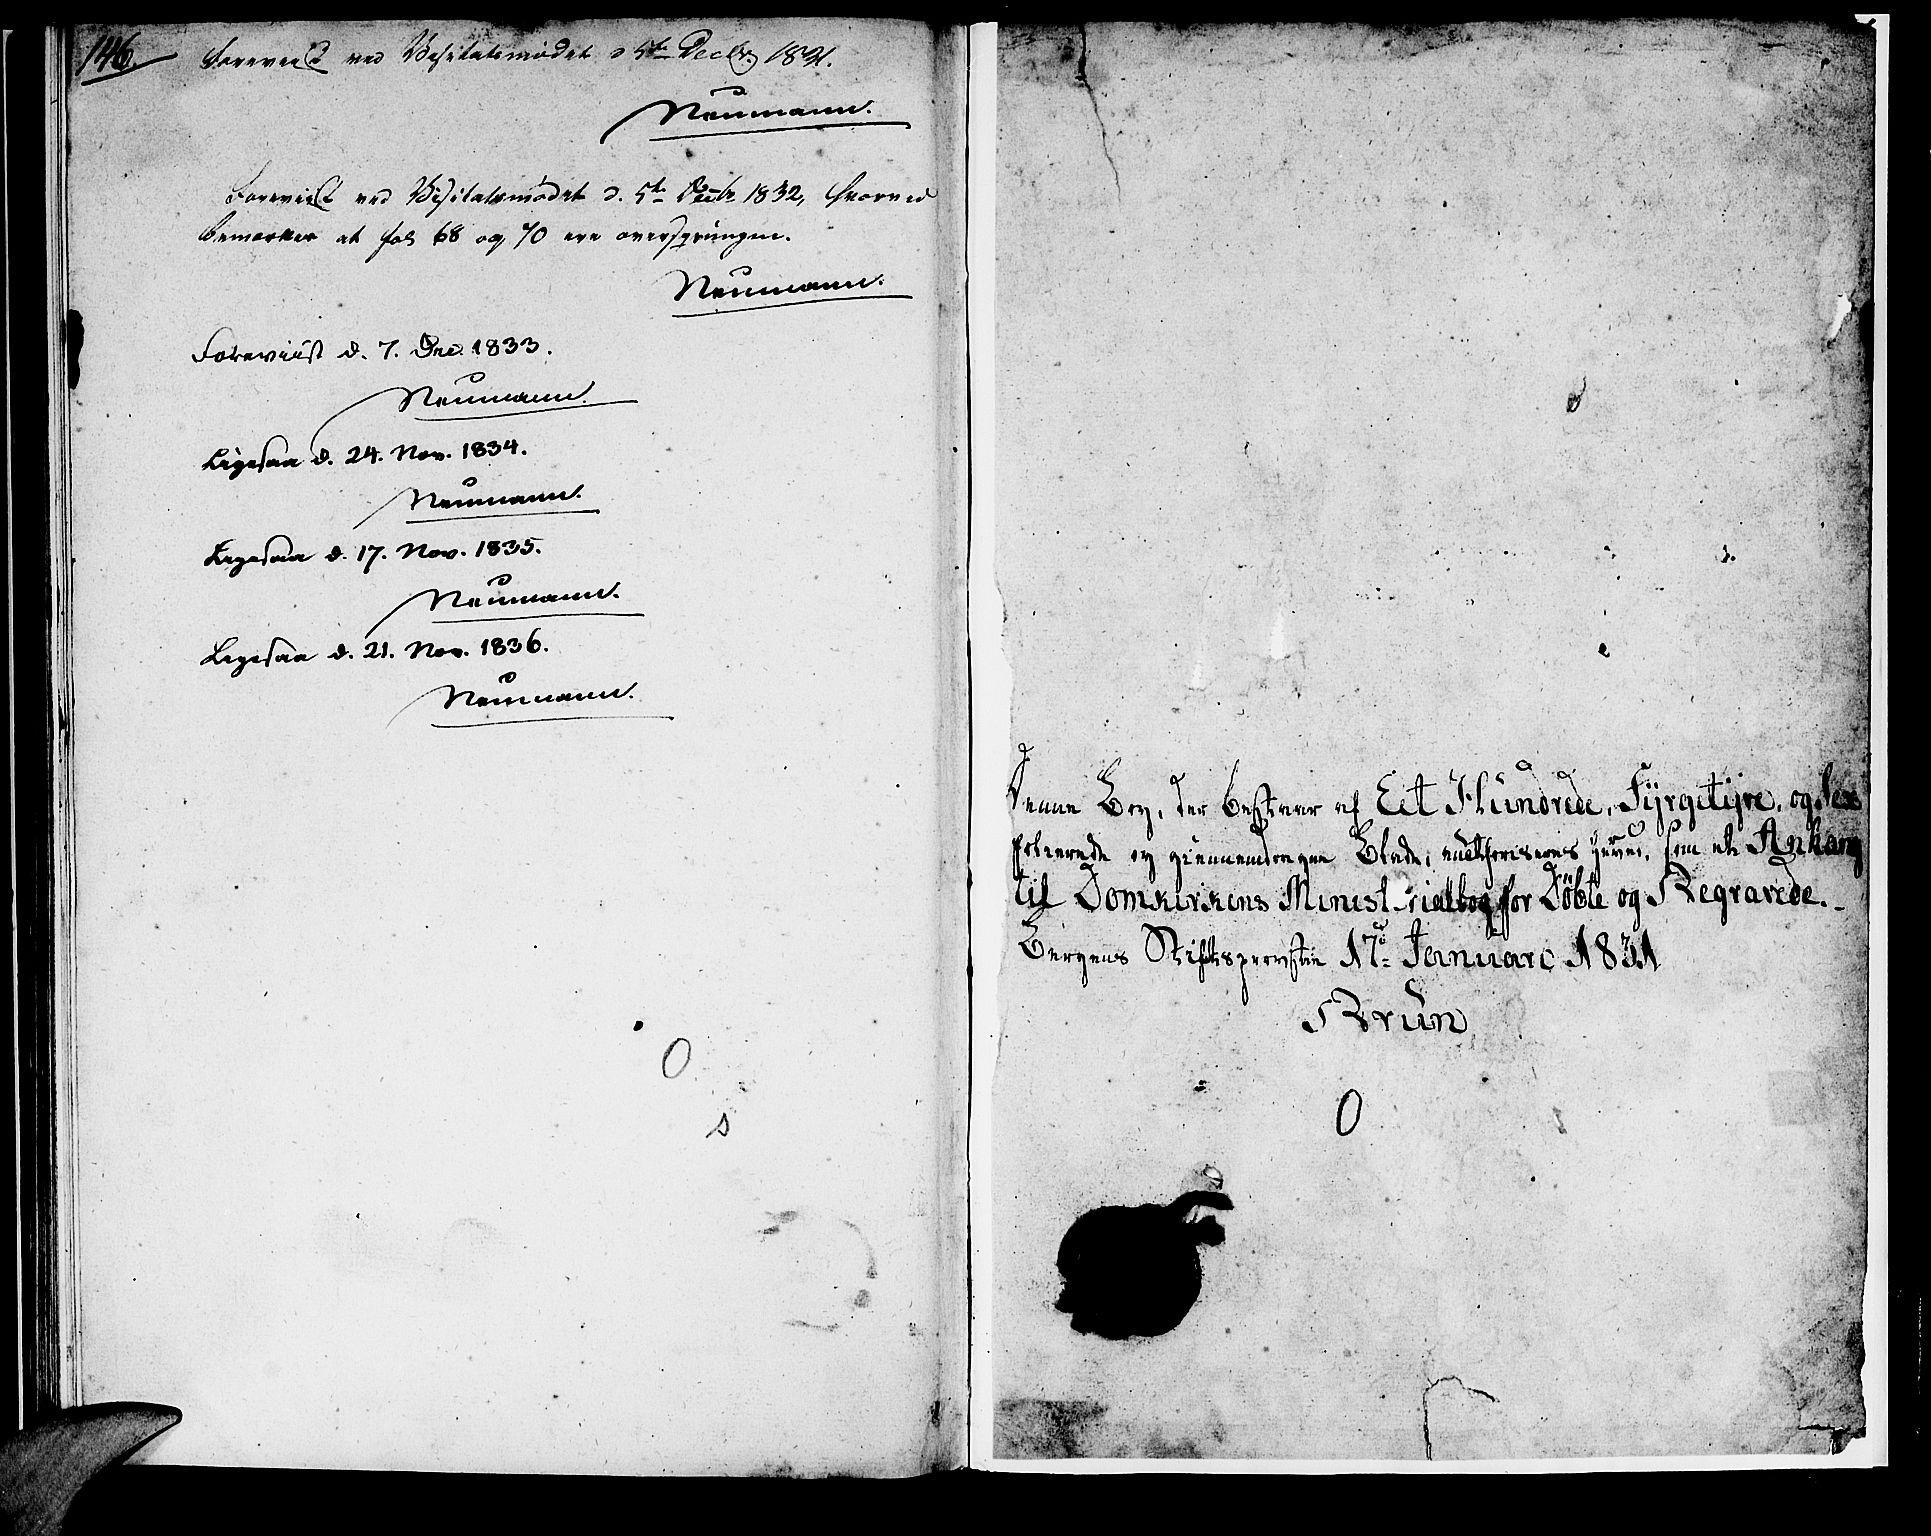 SAB, Domkirken Sokneprestembete, H/Haa/L0014: Ministerialbok nr. A 13, 1830-1837, s. 145